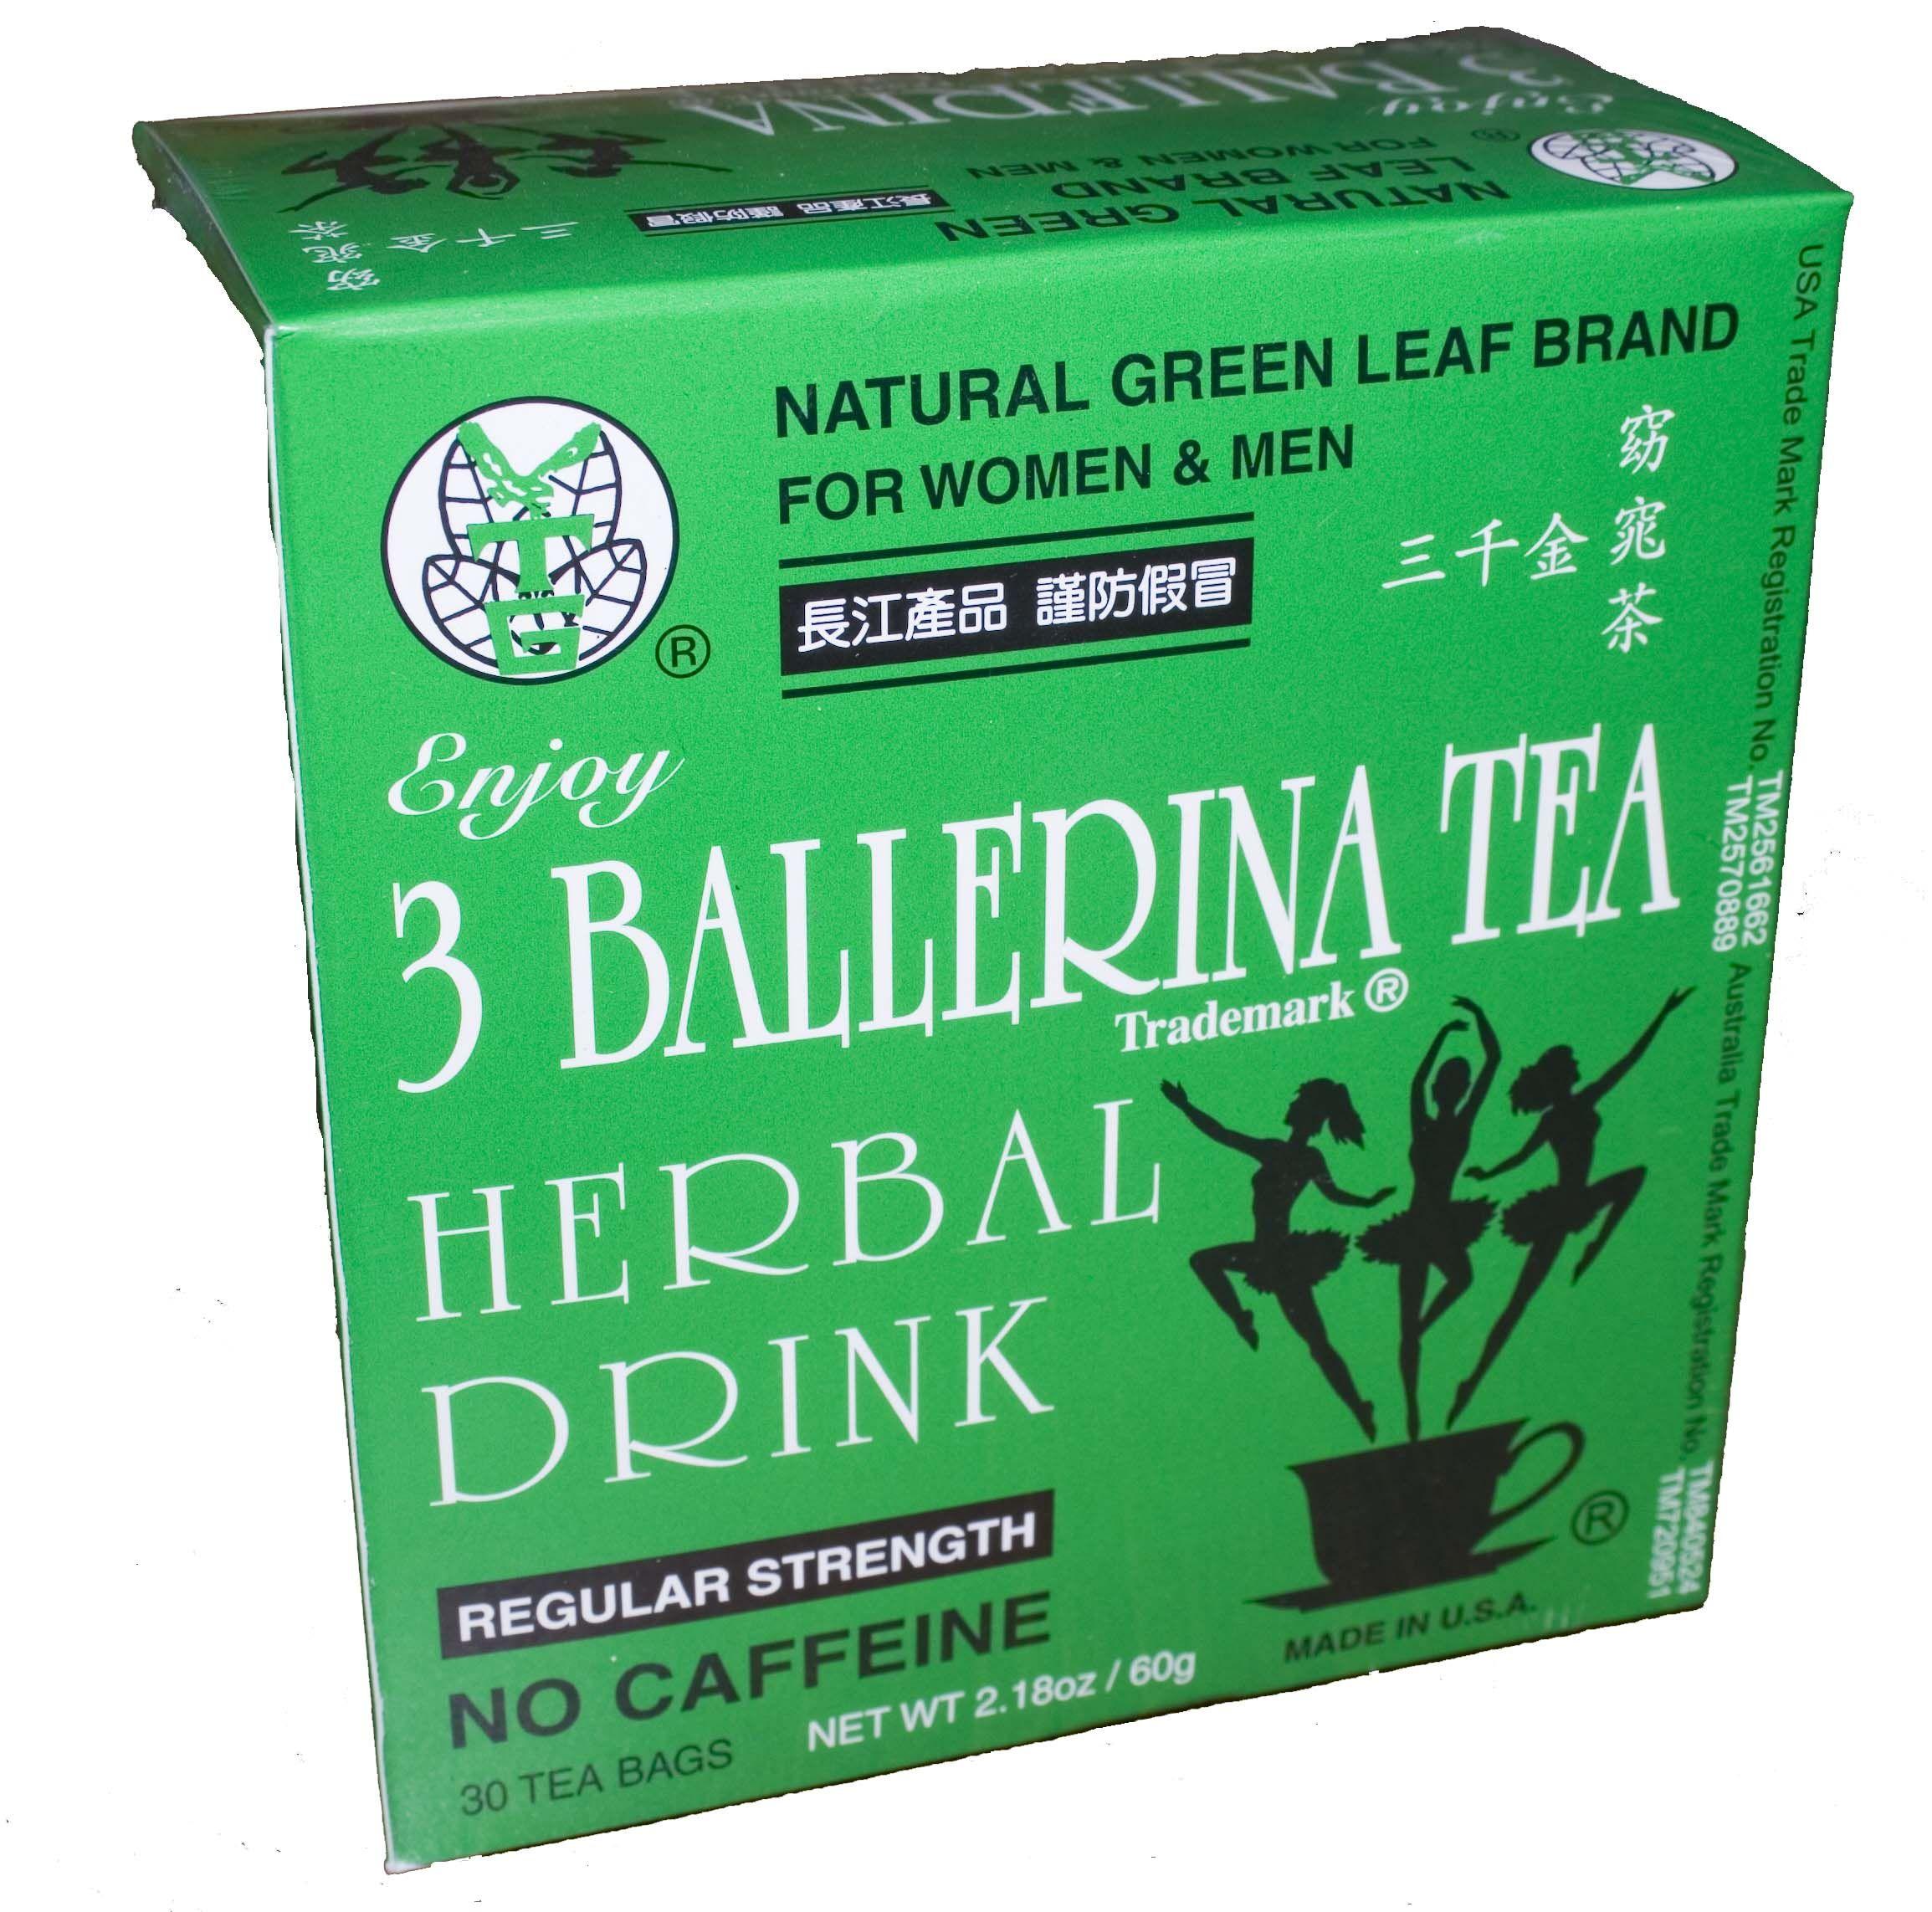 Ballerina Tea Herbal Drink Slim Chinese Green Drink Ballerina Herbal Tea Herbal Drinks Herbalism